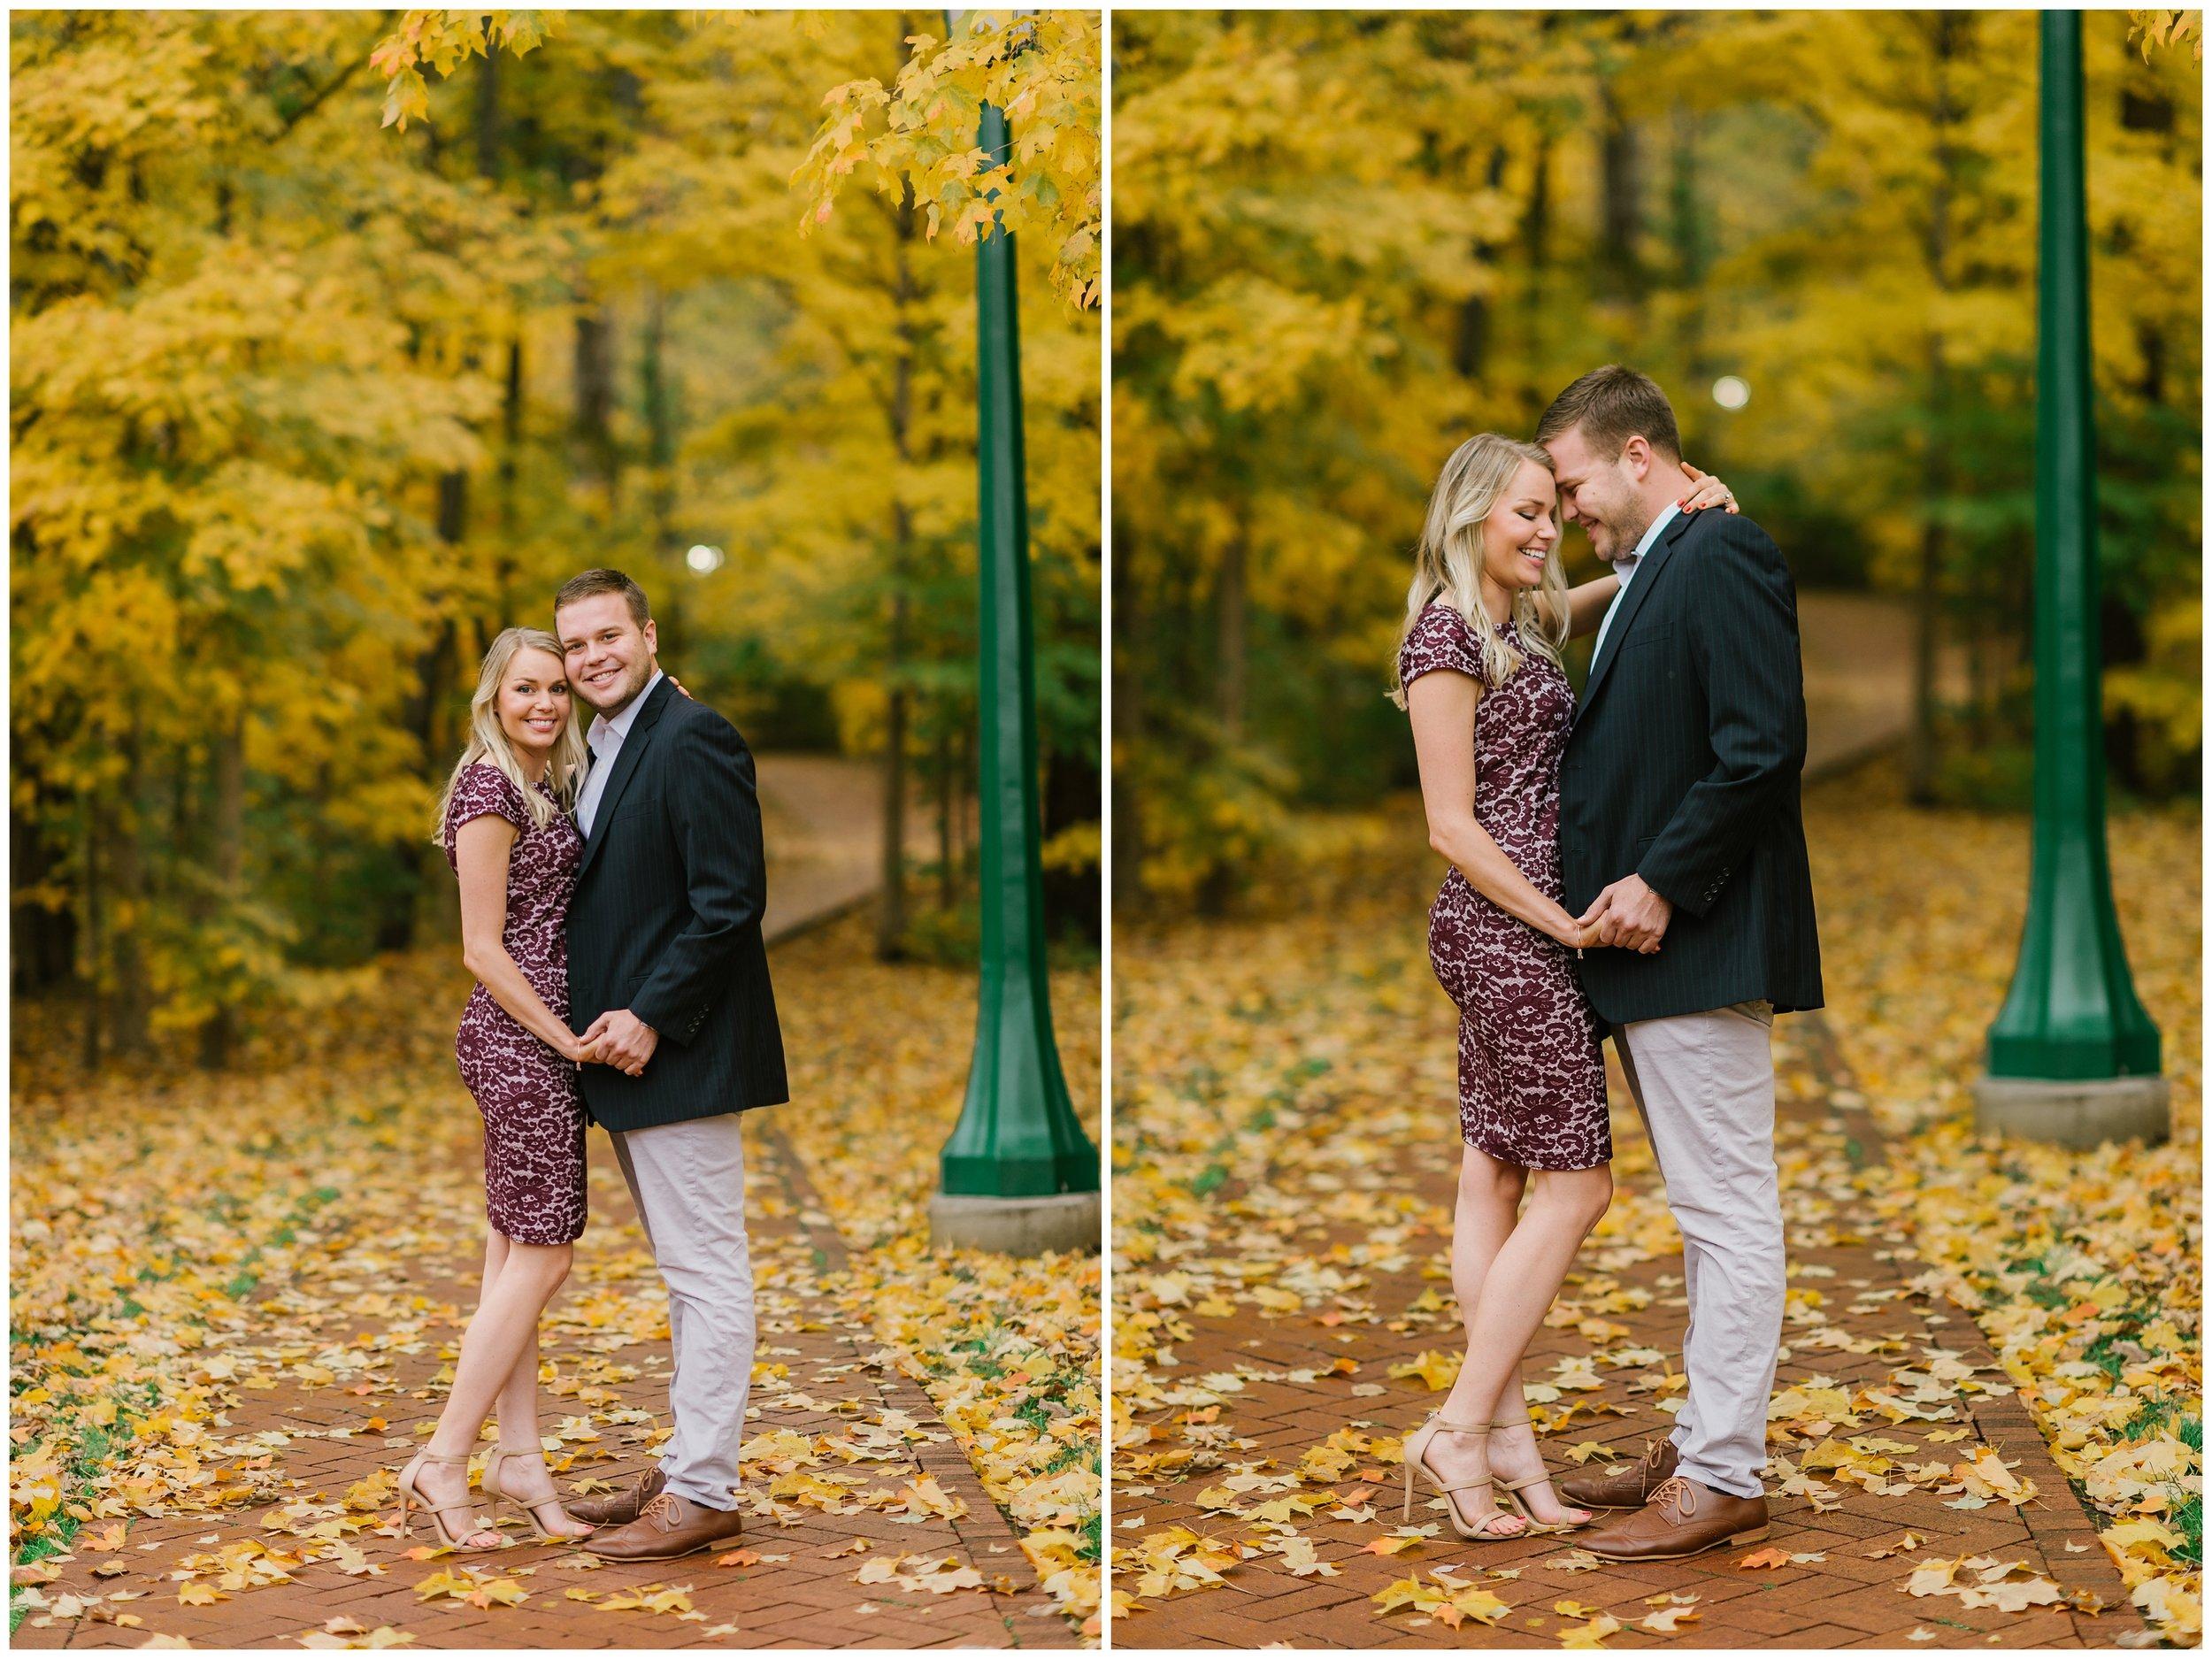 Rebecca_Shehorn_Photography_Indianapolis_Wedding_Photographer_7677.jpg